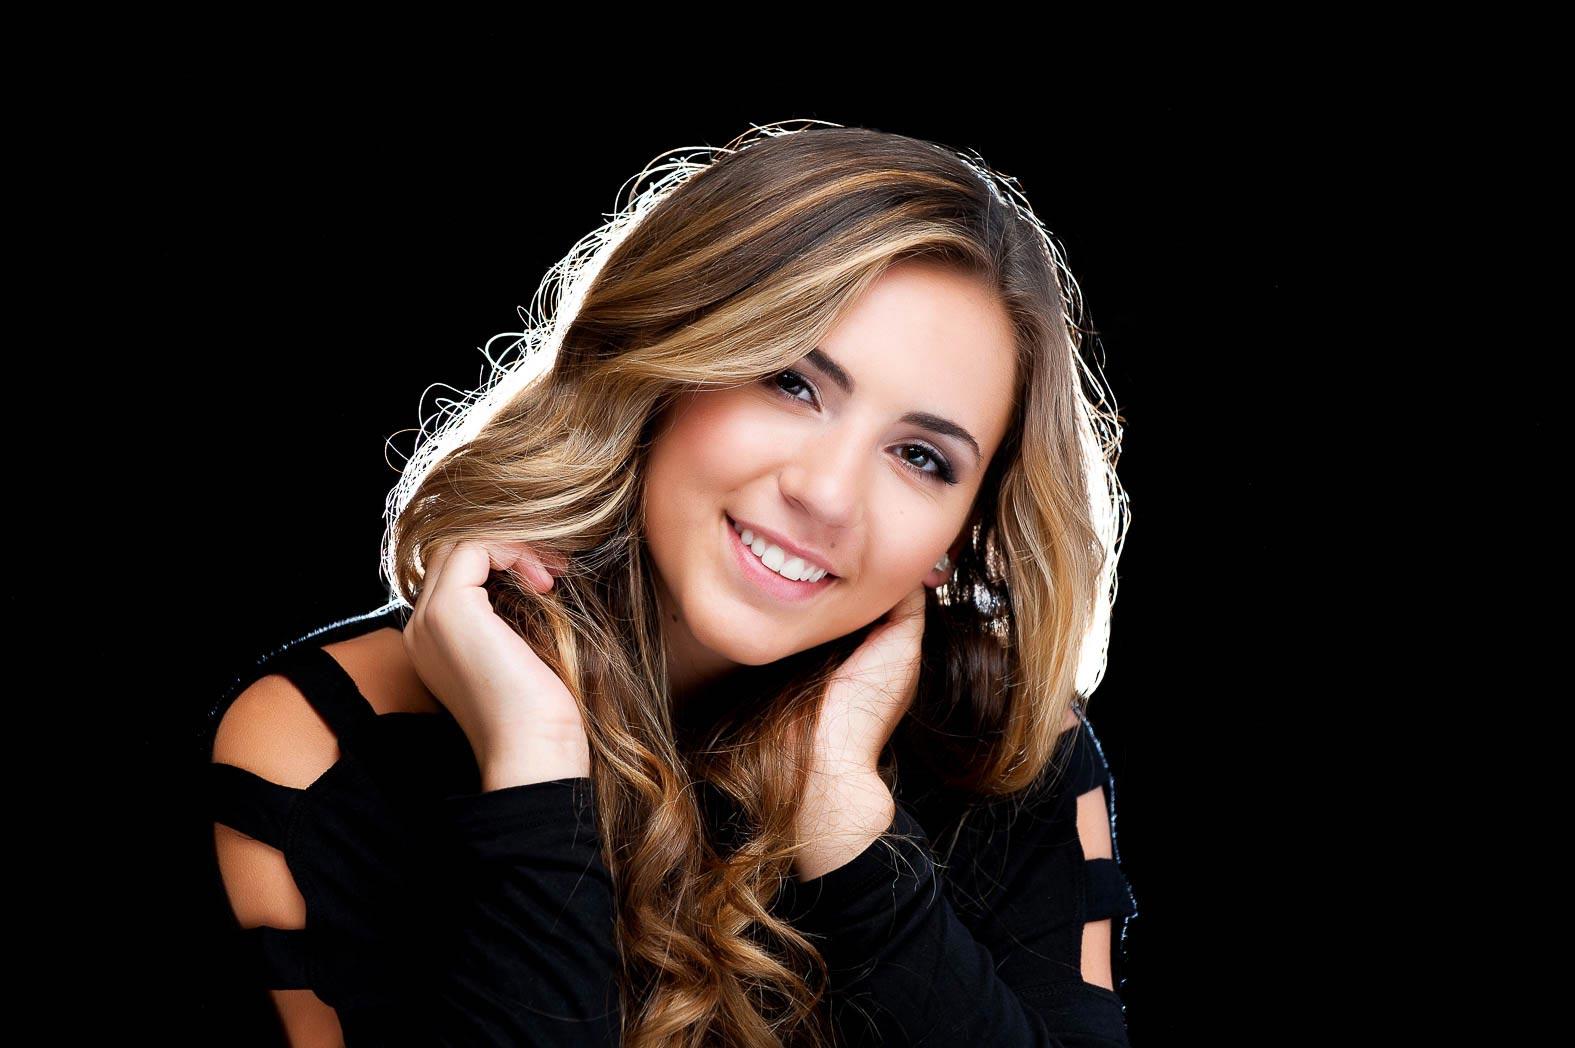 backlit senior picture of girl smiling in front of black background